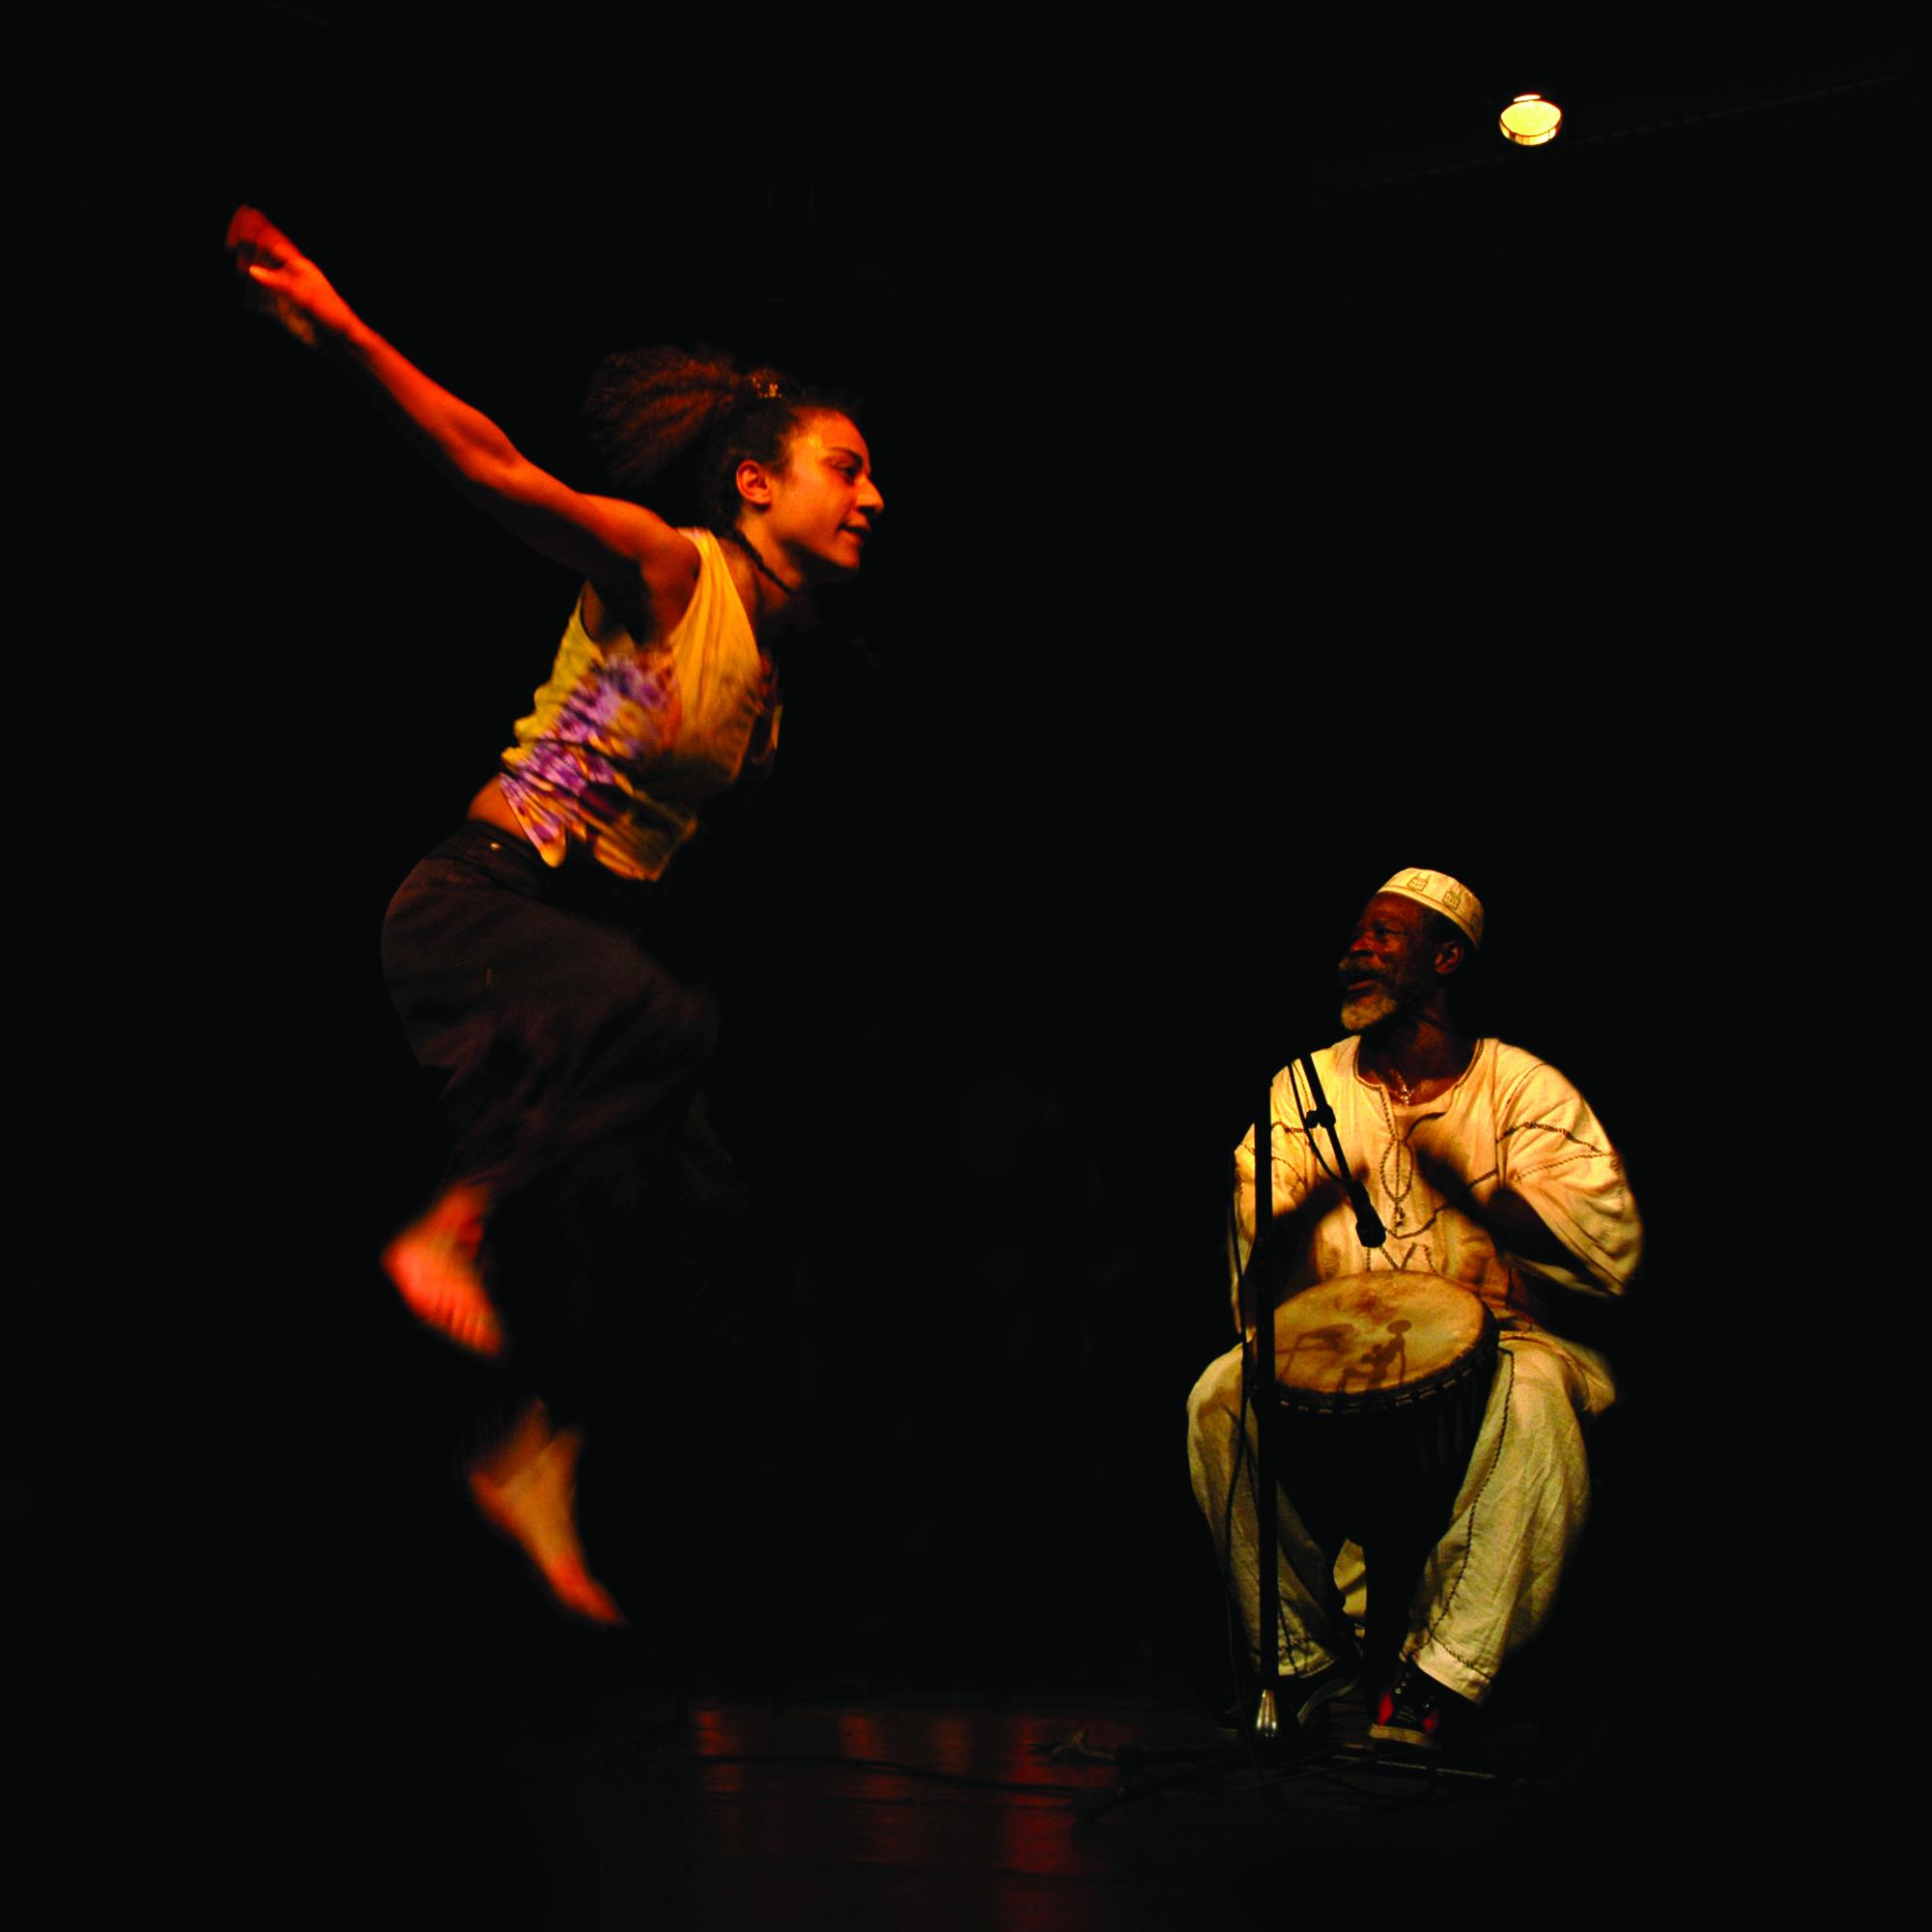 Danse africaine - Compagnie Dounia - Crédit: Mako